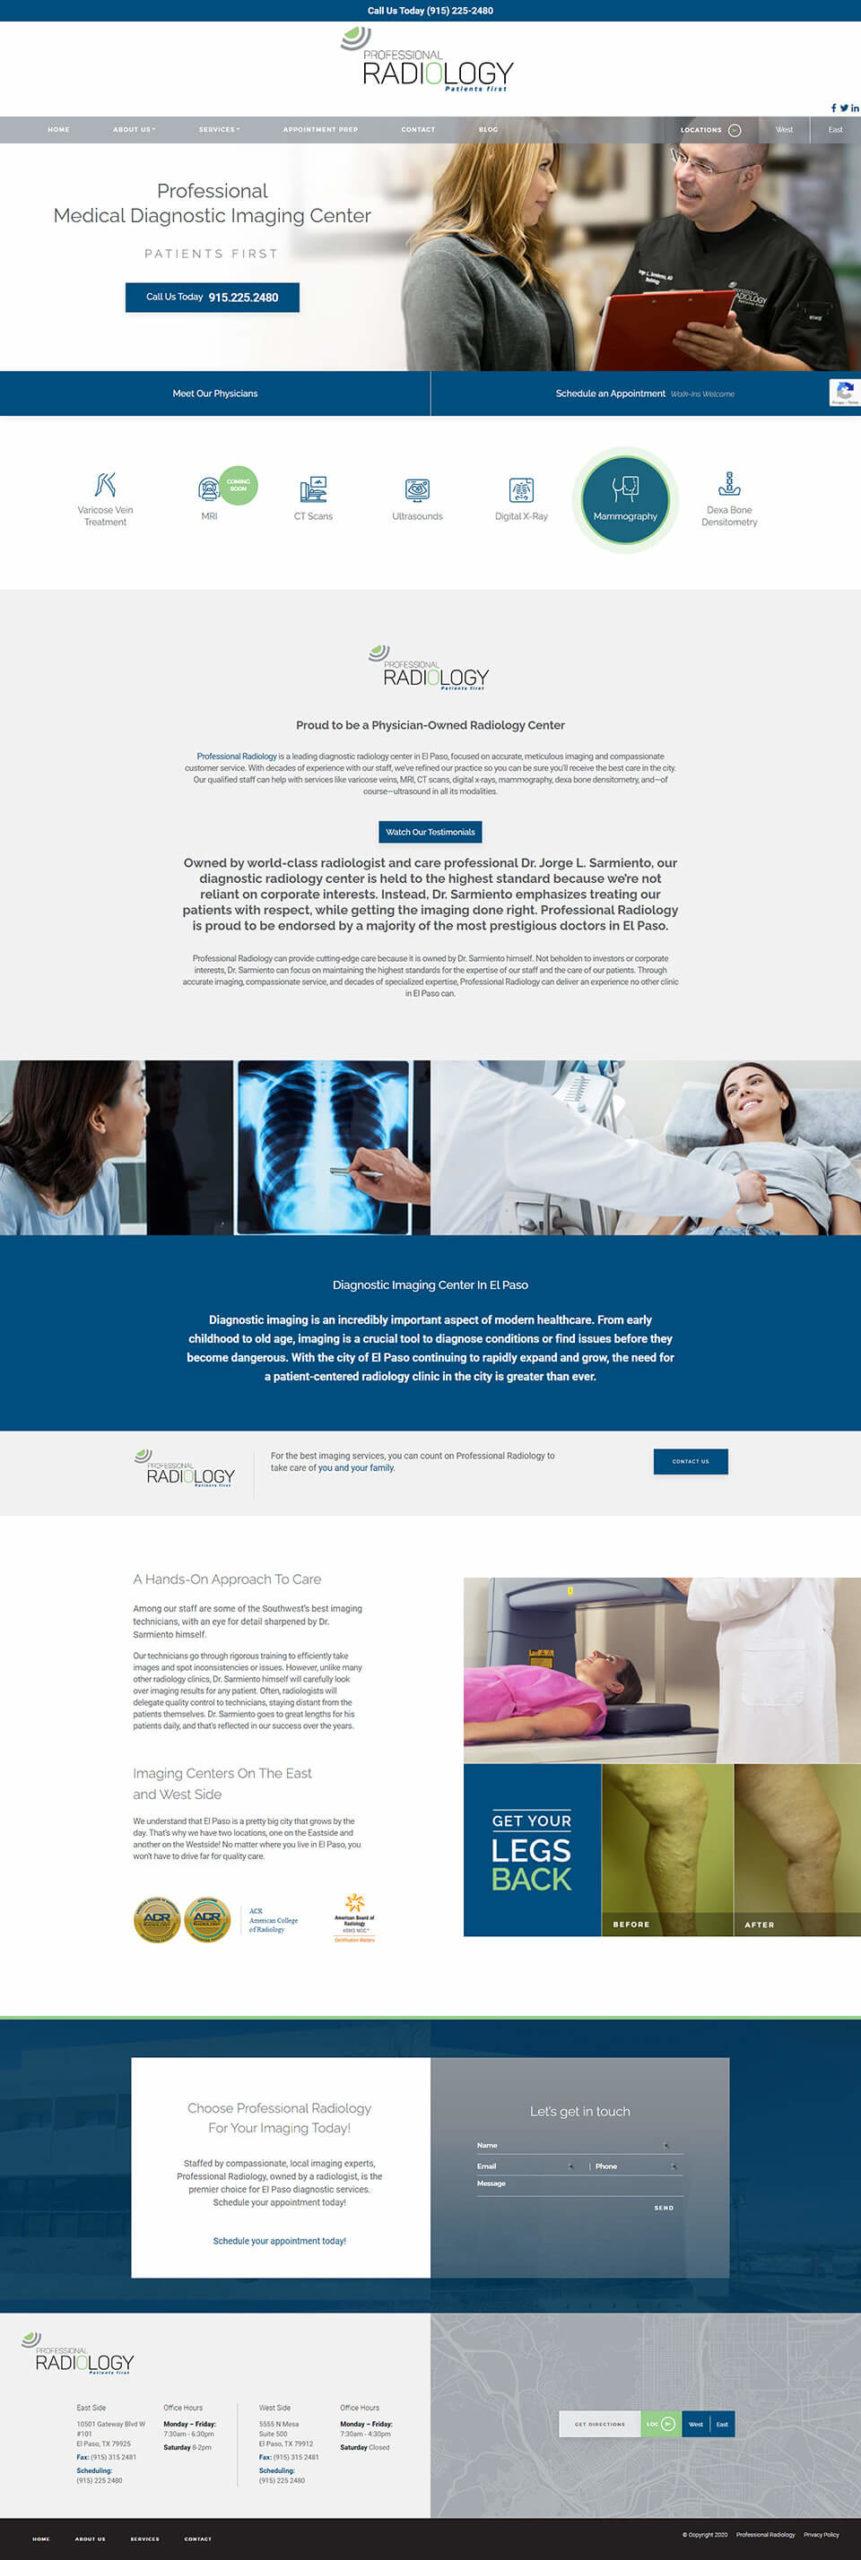 Professional Radiology website layout